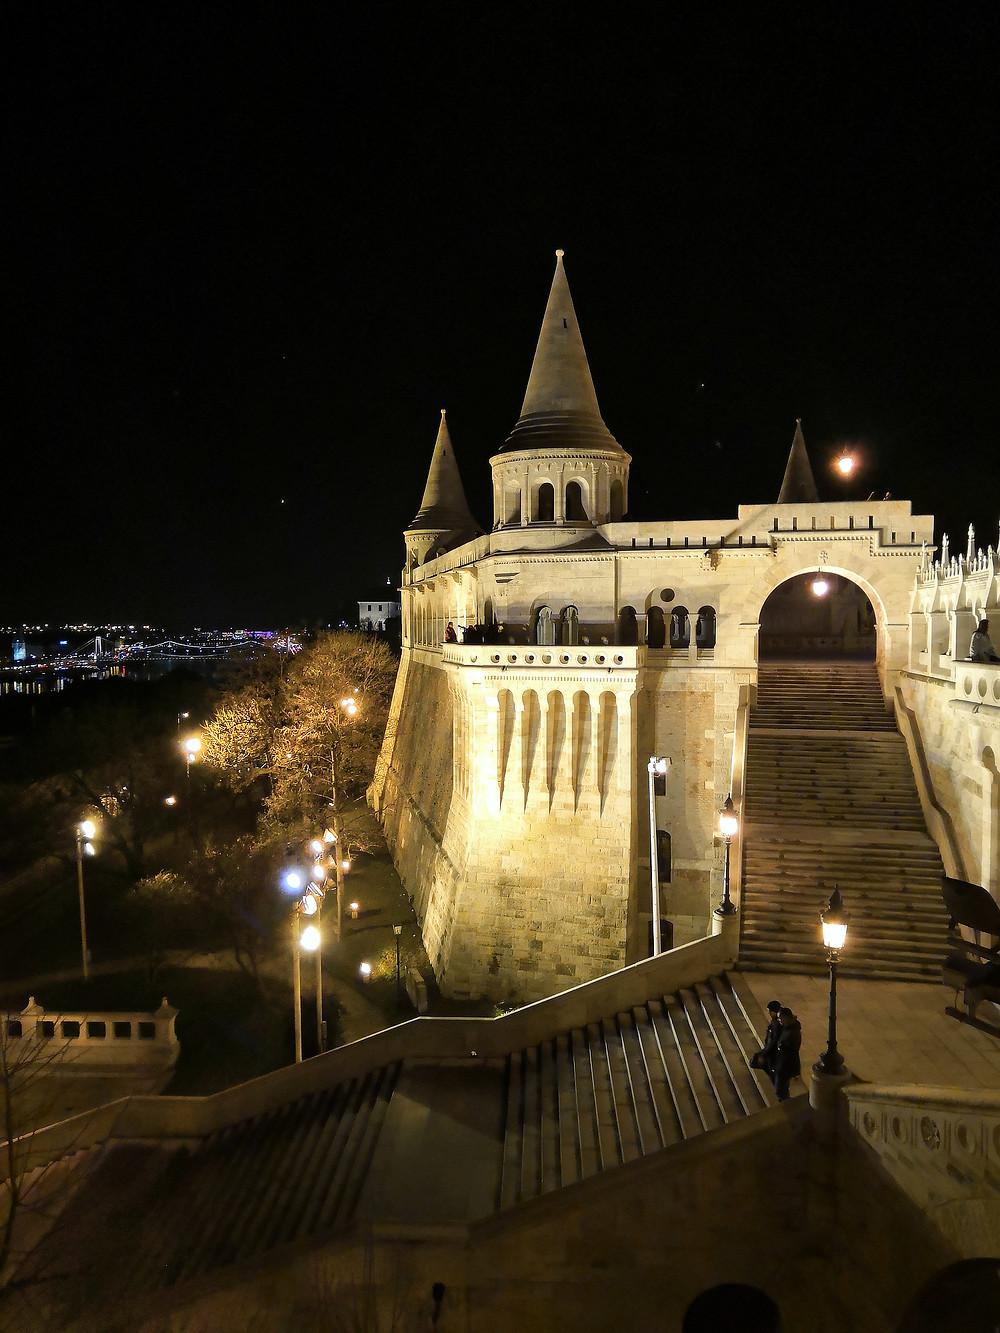 Fisherman's Bastion at night, Budapest